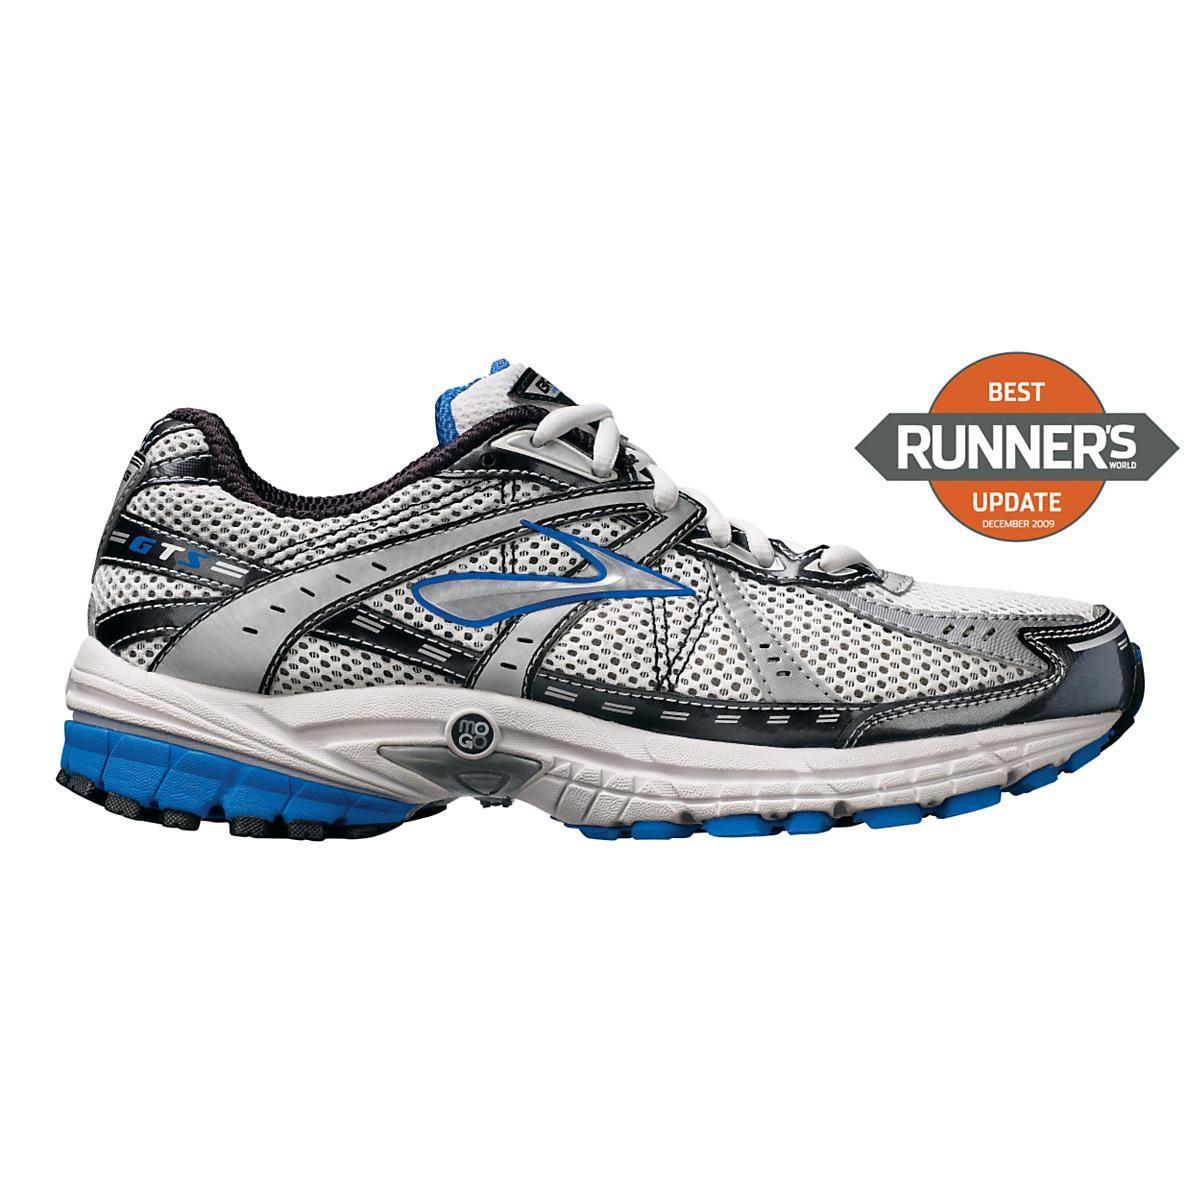 552d23688f7bb Mens Brooks Adrenaline GTS 10 Running Shoe at Road Runner Sports